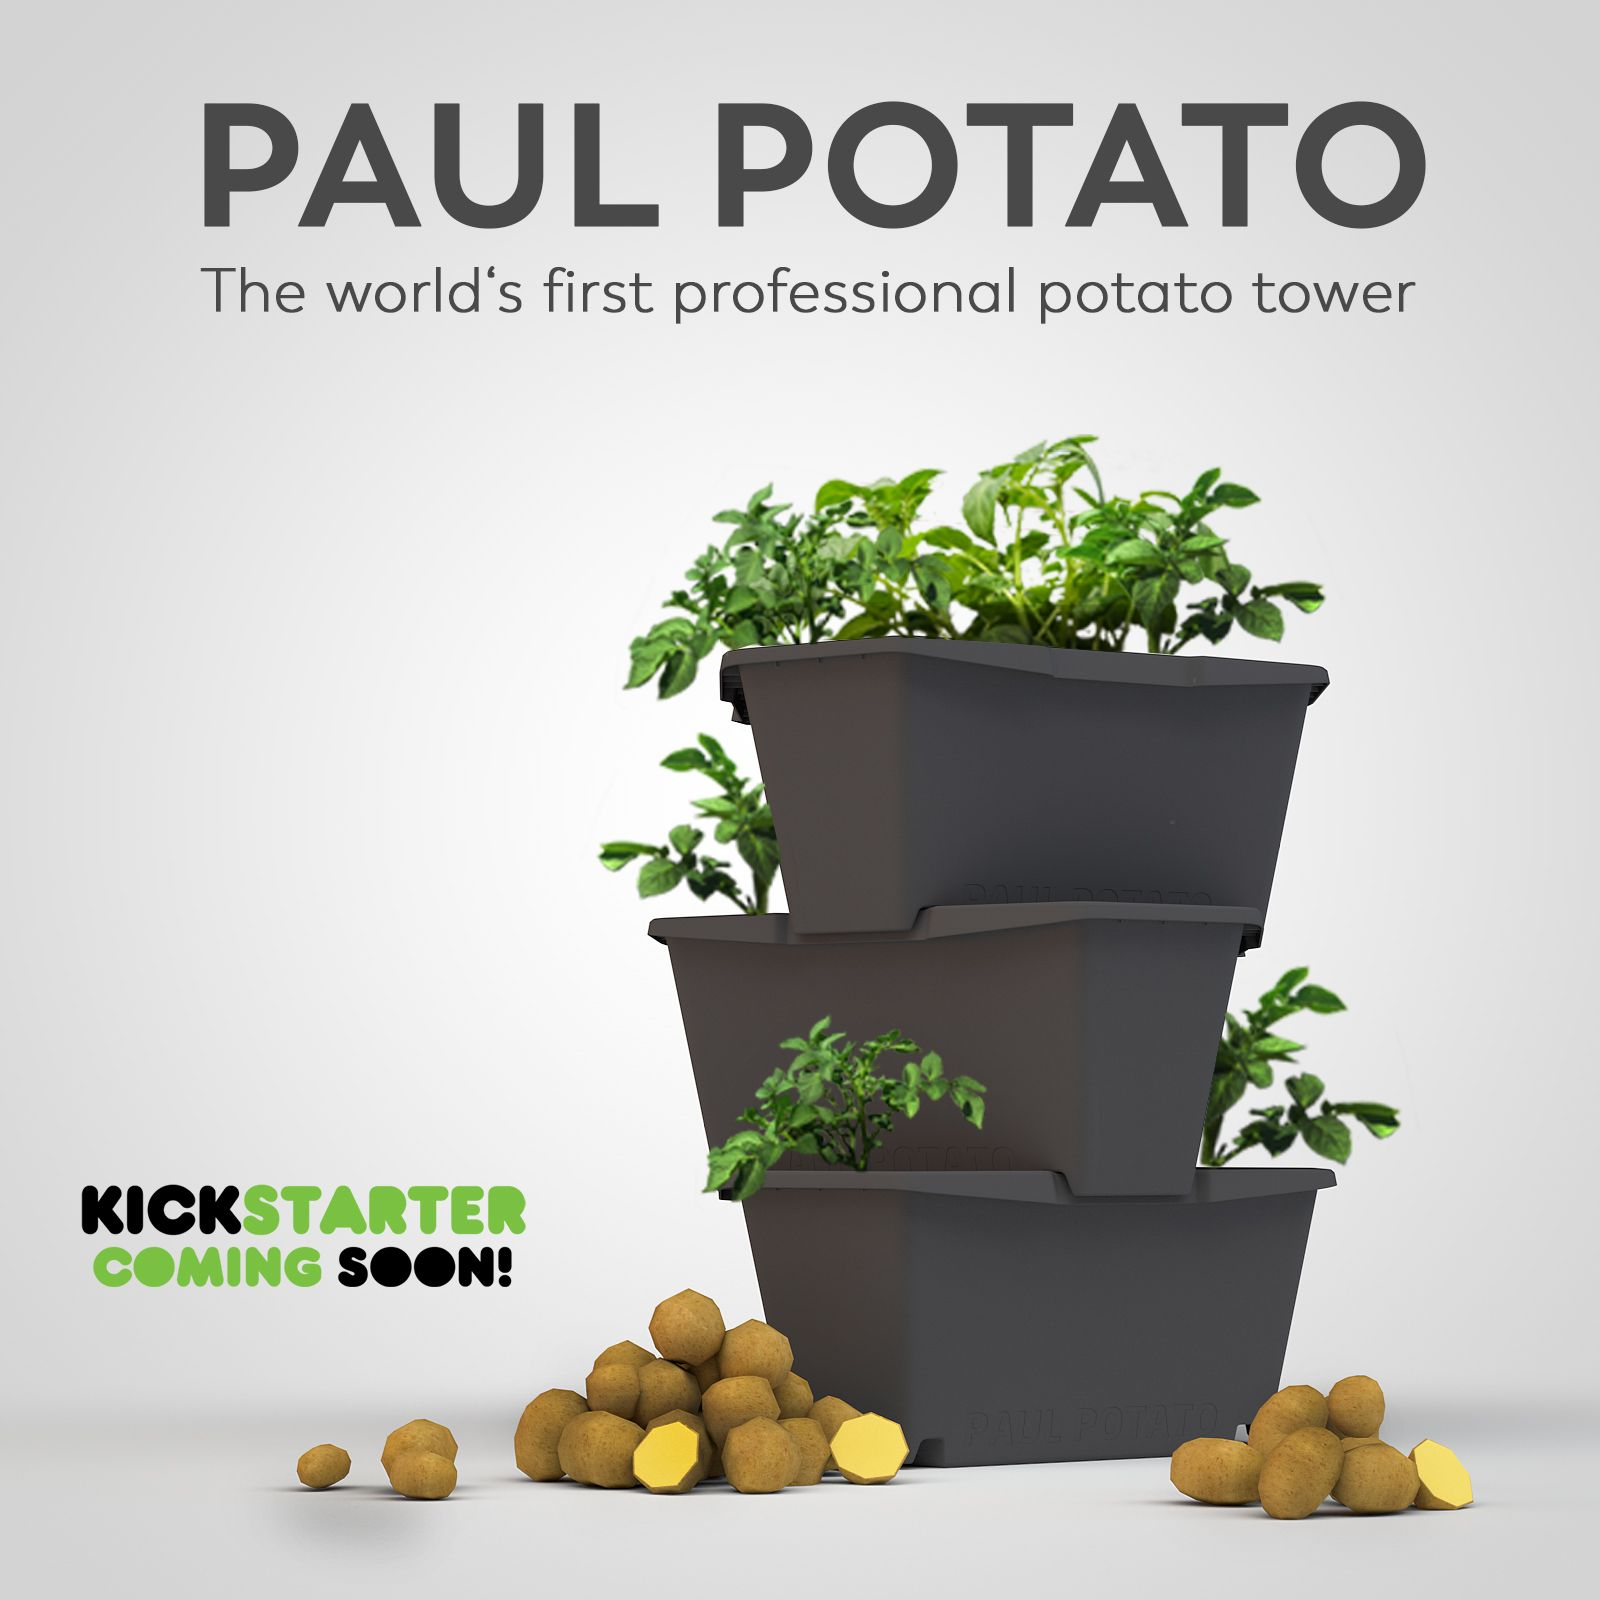 Full Size of Paul Potato Kartoffelturm Erfahrungen Wohnzimmer Paul Potato Kartoffelturm Erfahrungen